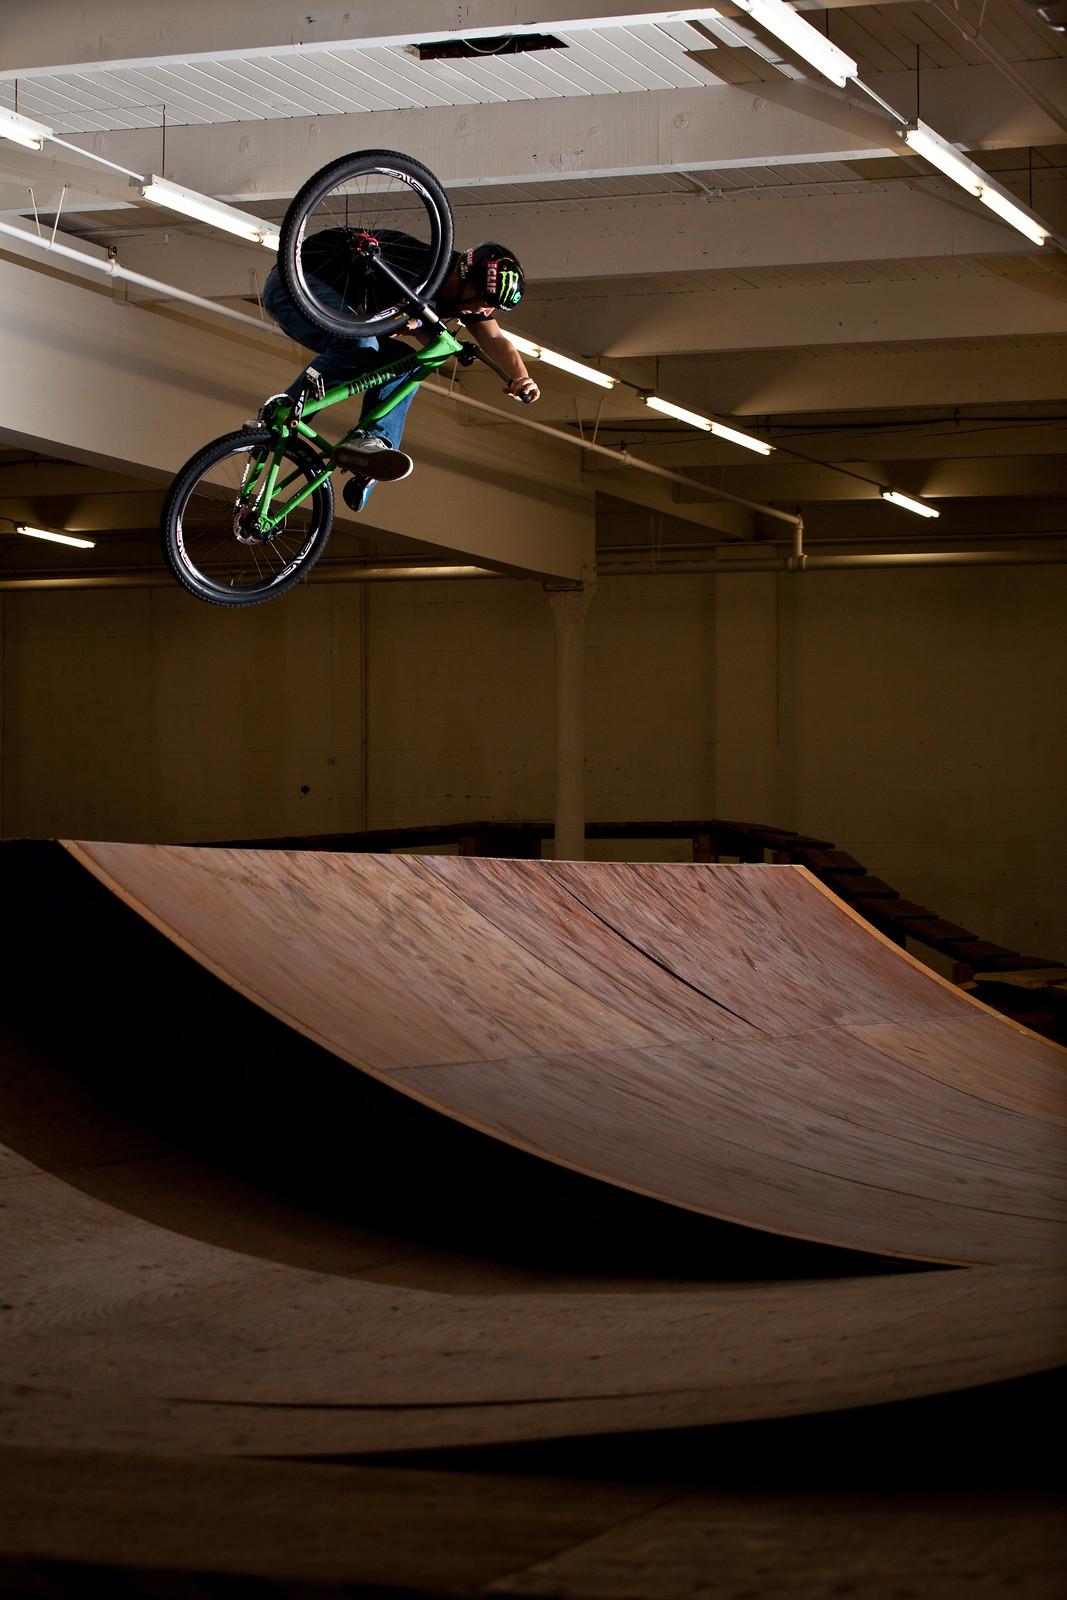 Jamie Goldman Lumberyard Invert - Jamie Goldman - Mountain Biking Pictures - Vital MTB